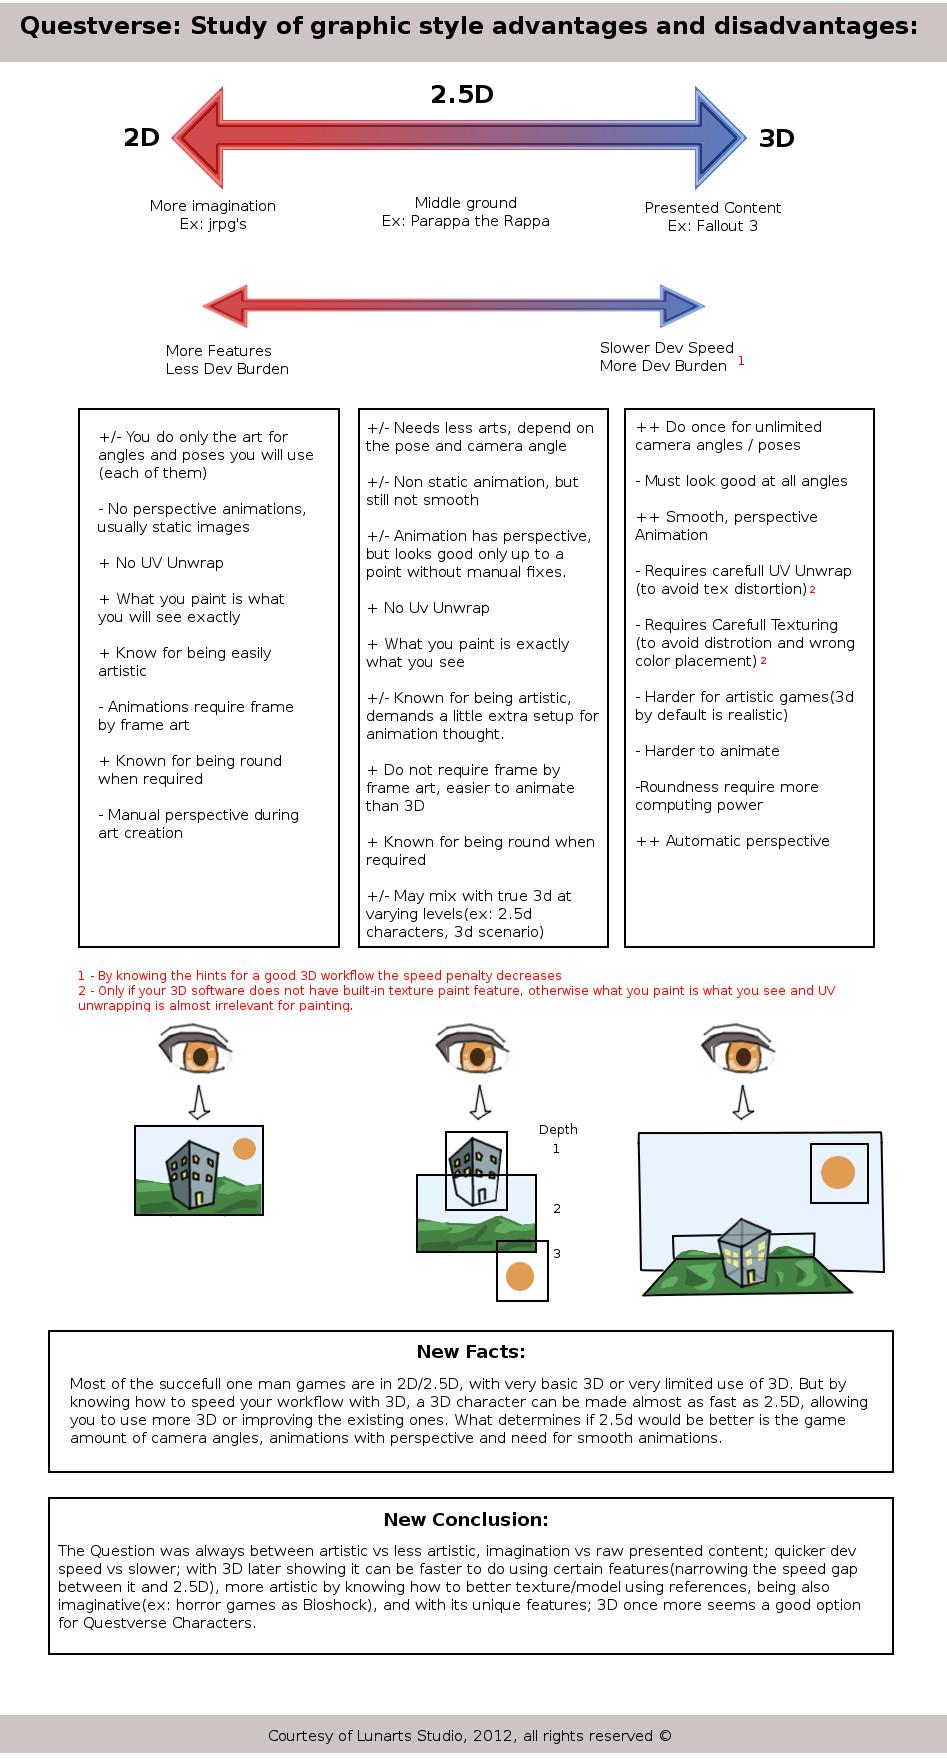 Questverse Graphics study